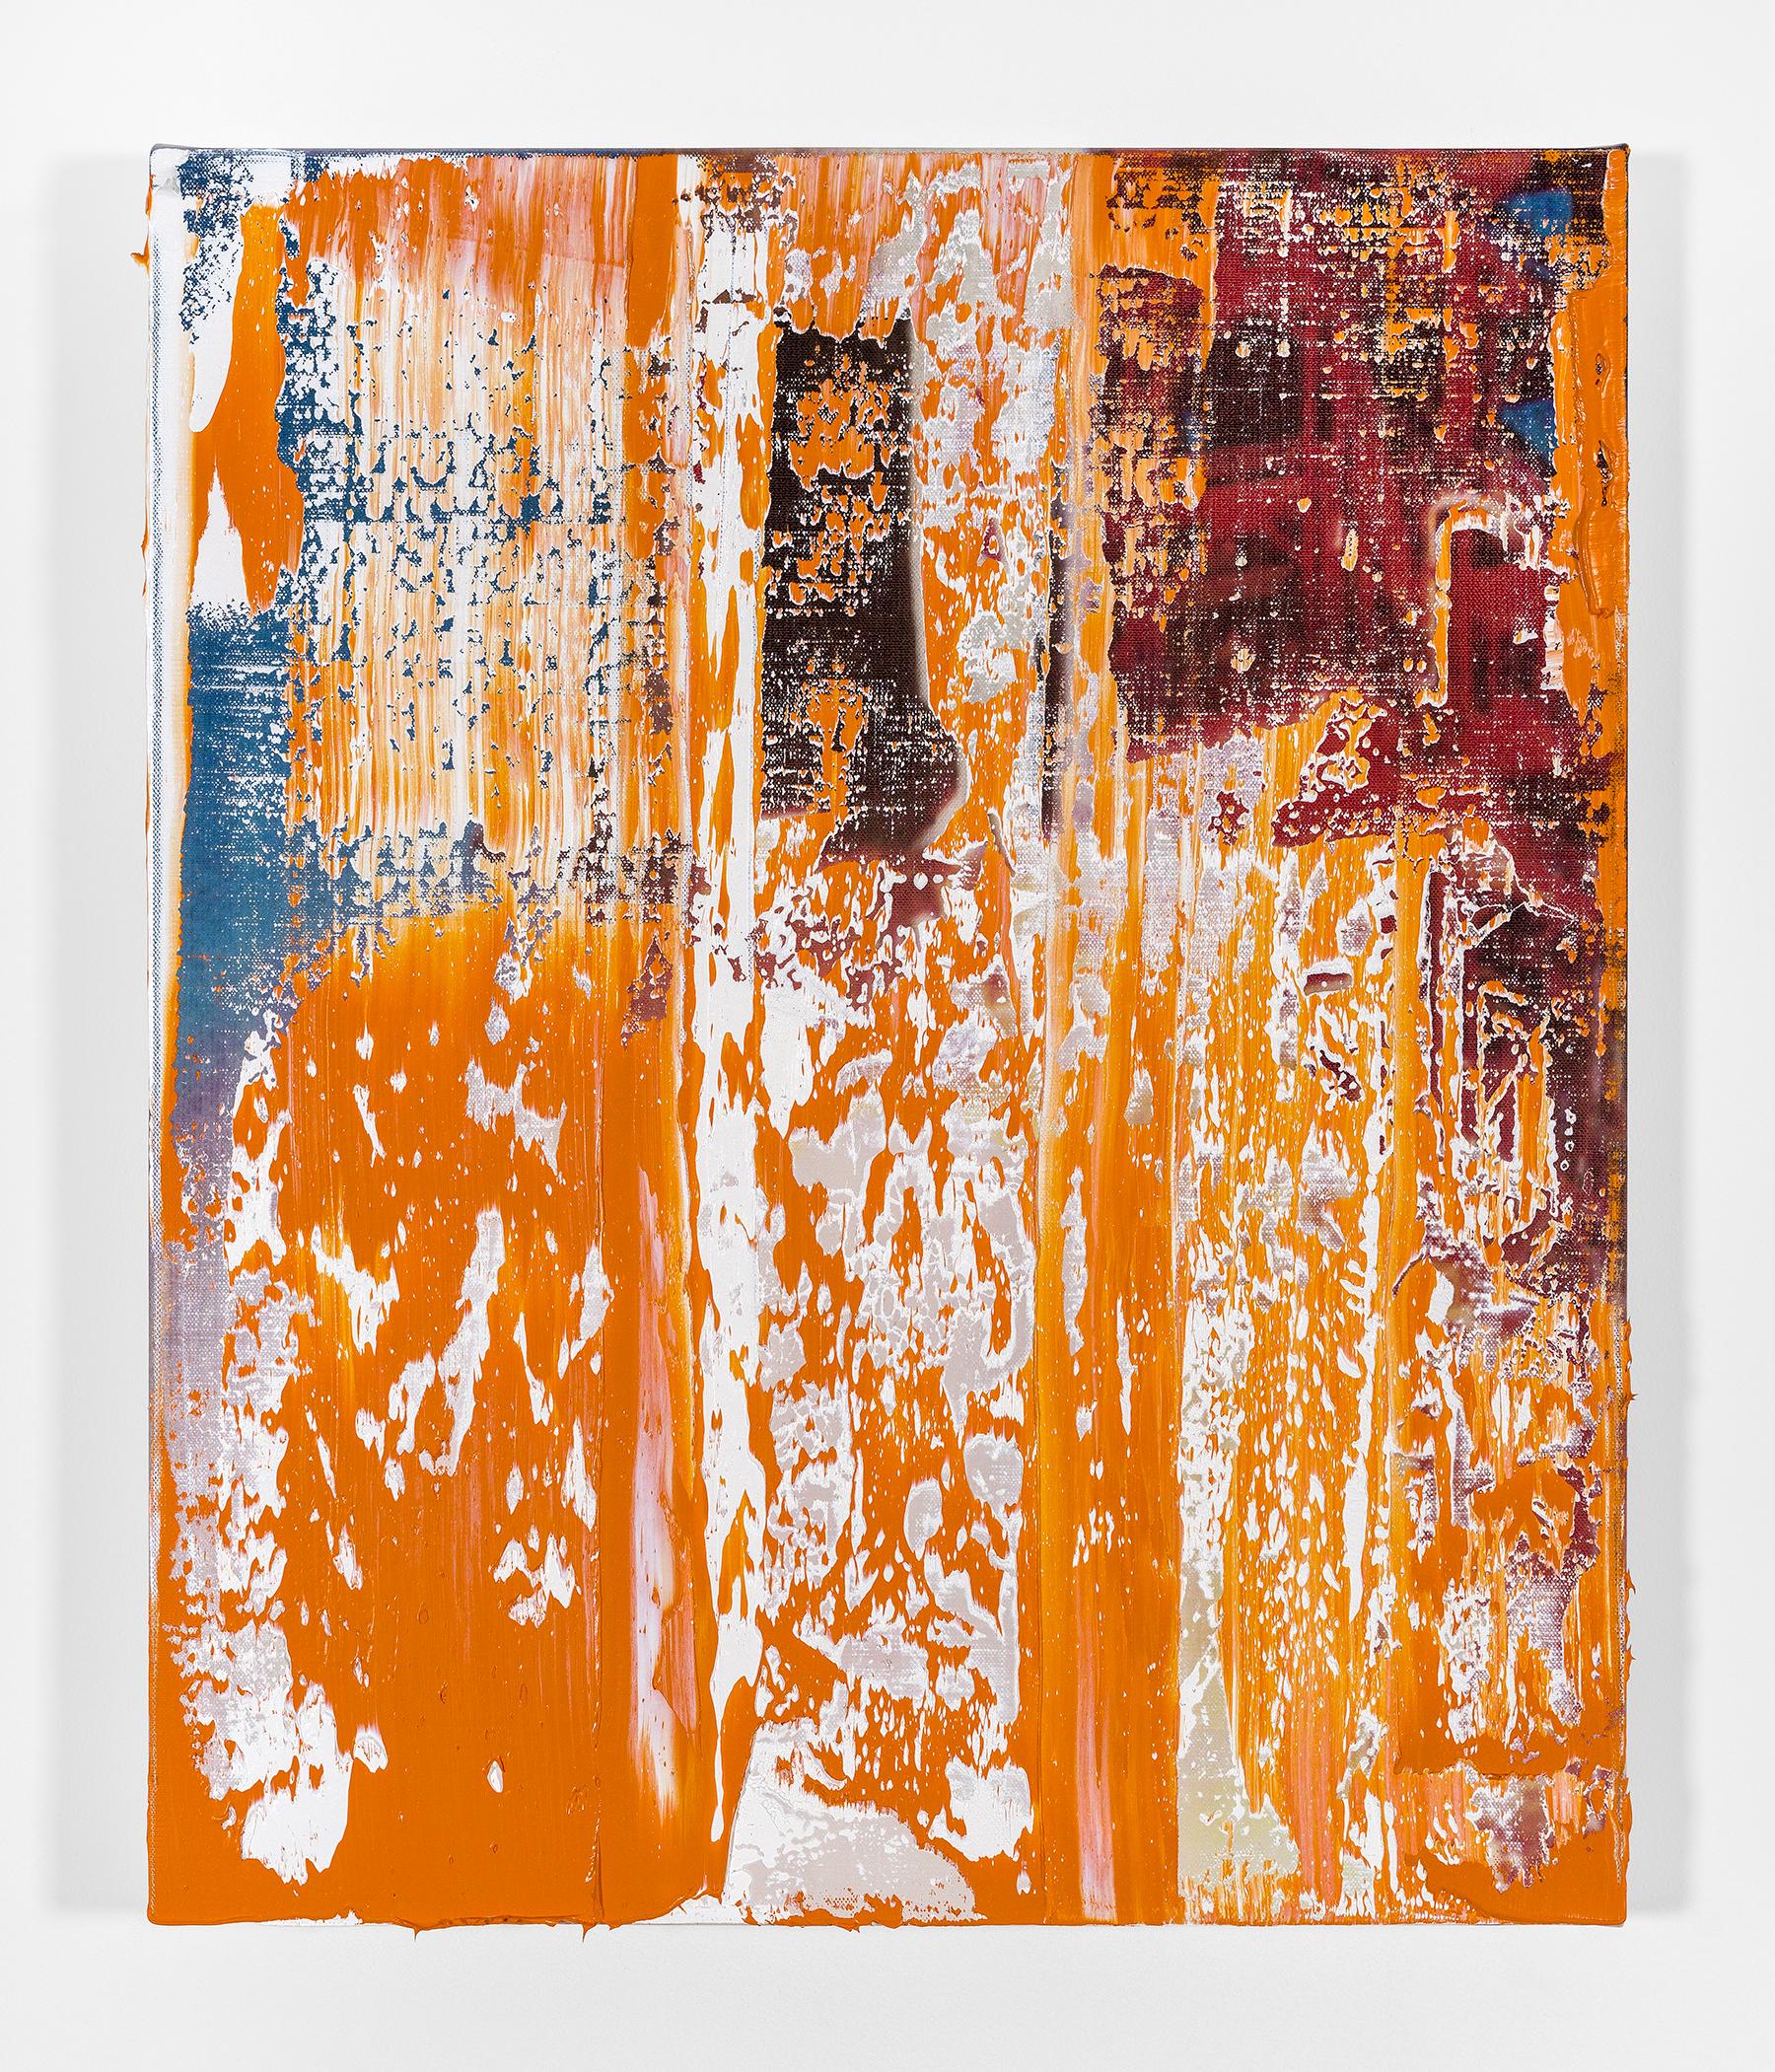 Michael Kagan  Boom Shakalaka 5, 2018  Oil on linen  24h x 20w in  60.96h x 50.80w cm  MK019